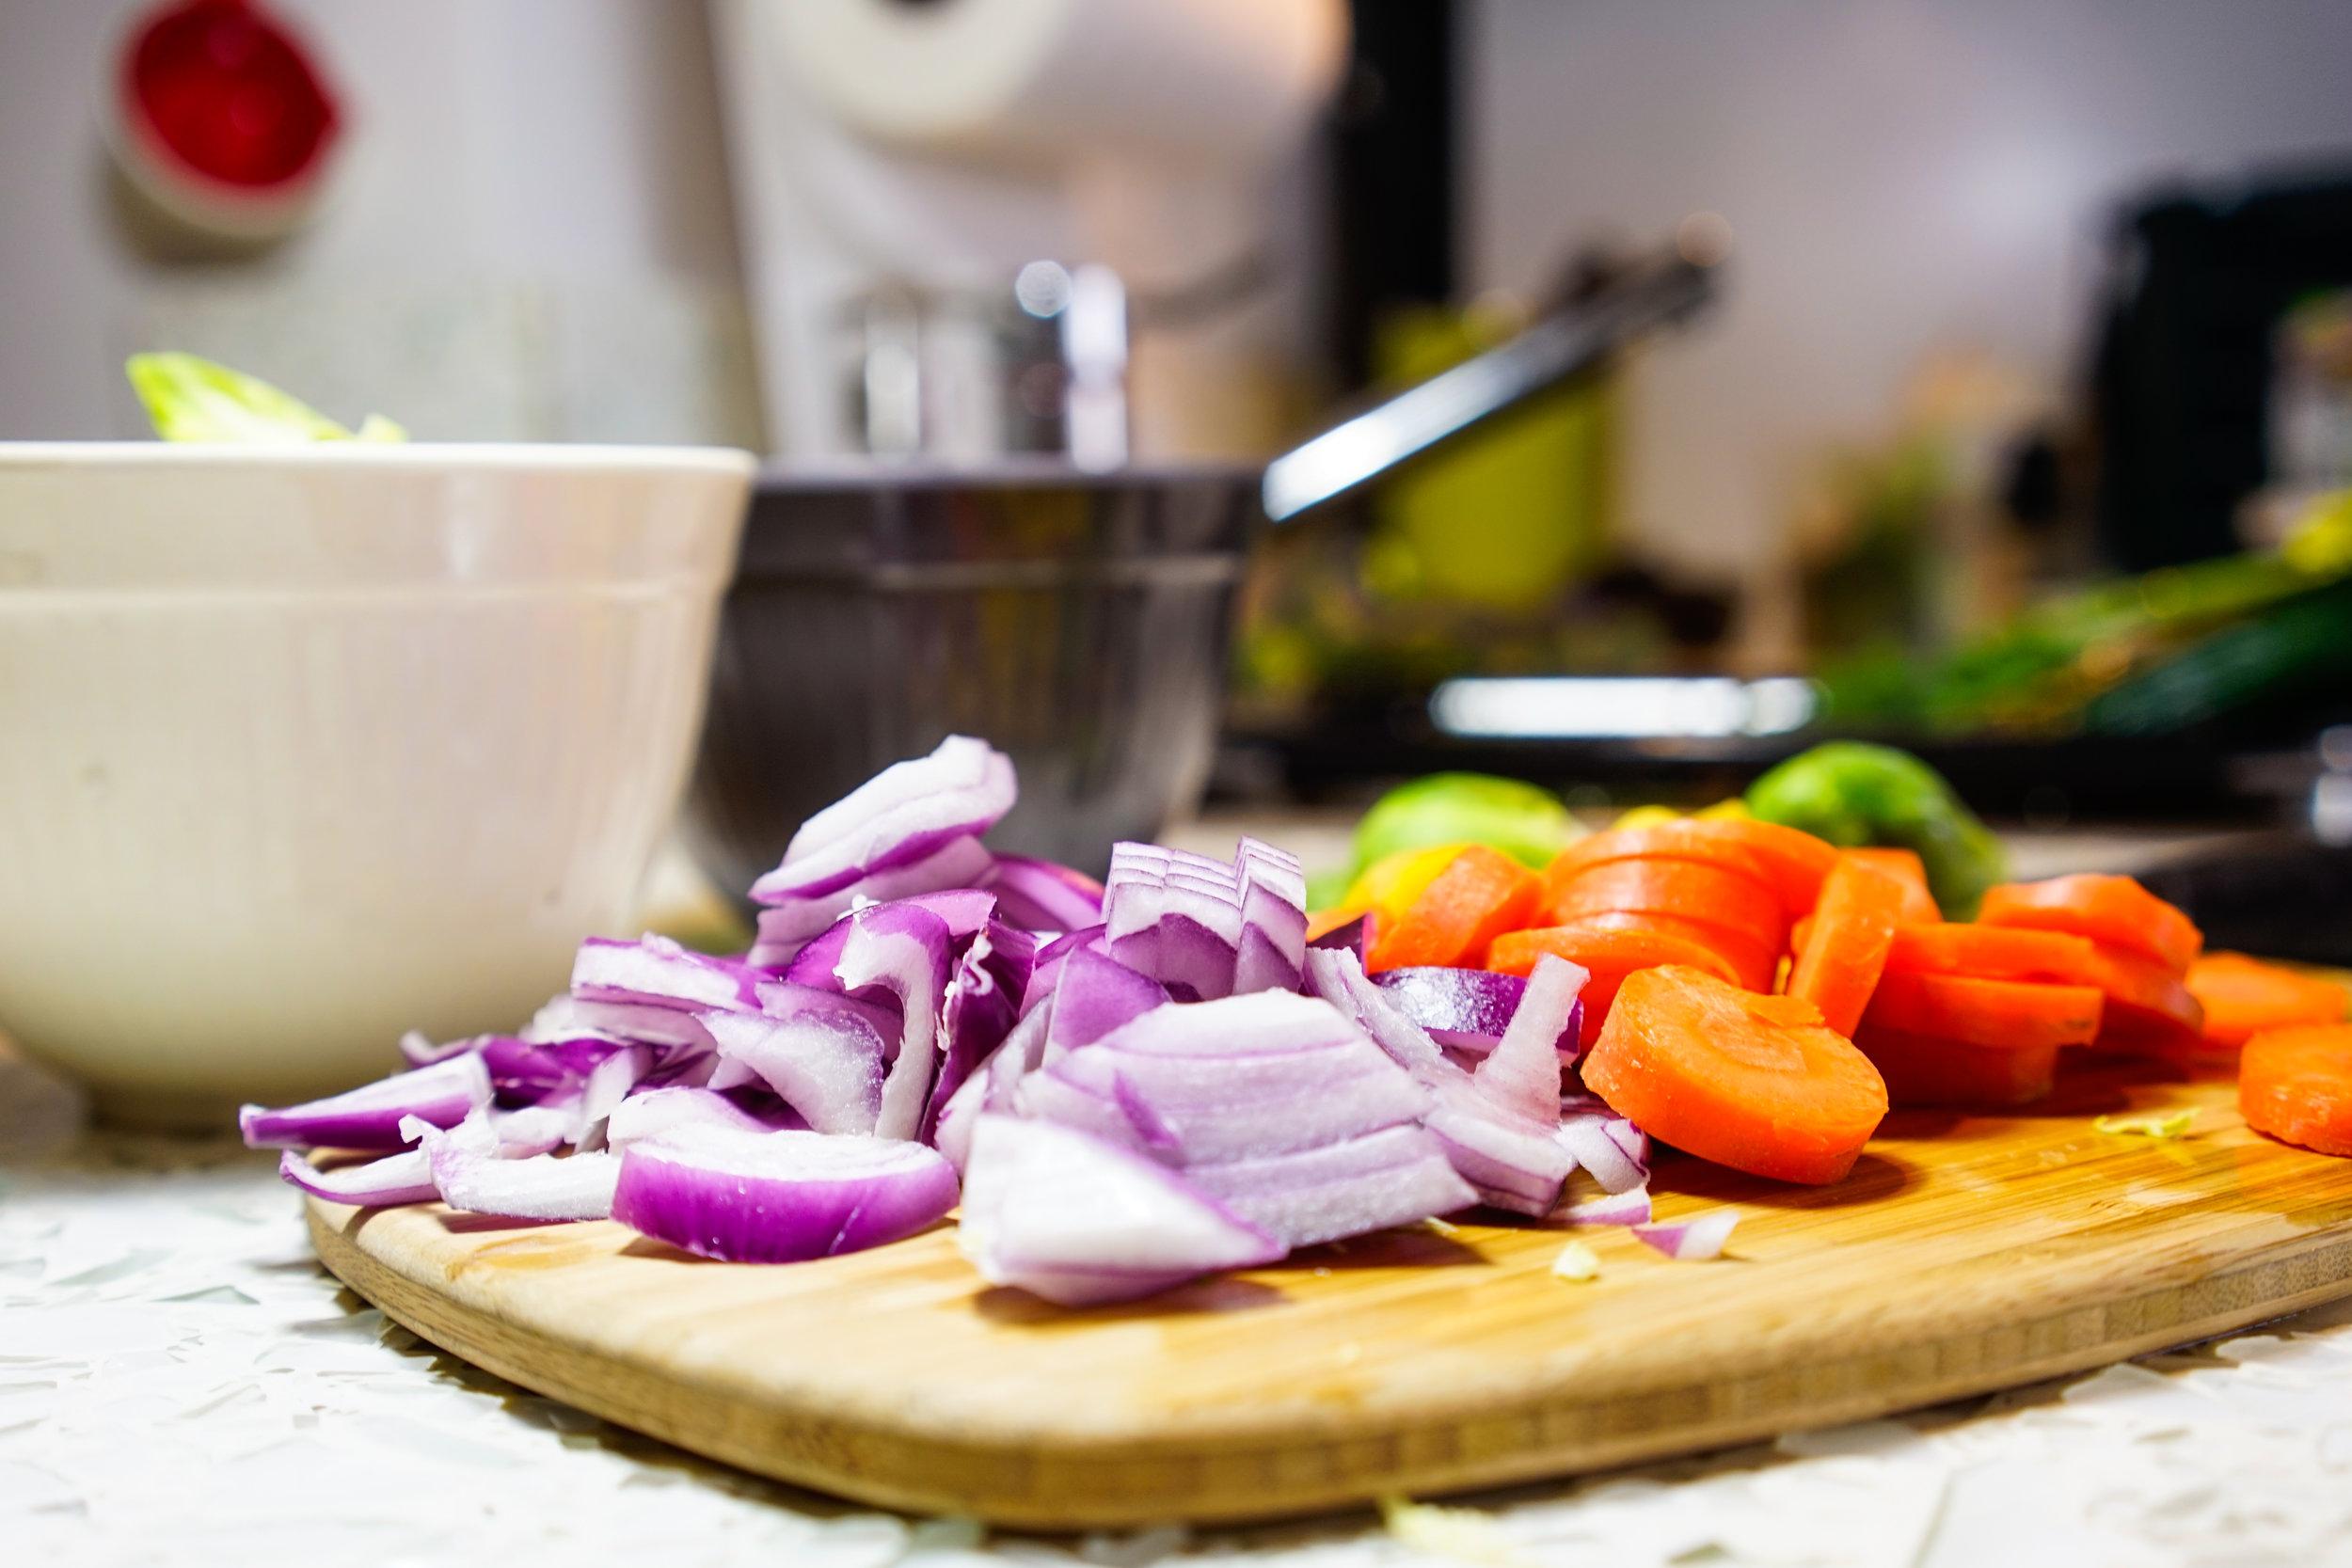 chopped veggies on cutting board-1.JPG